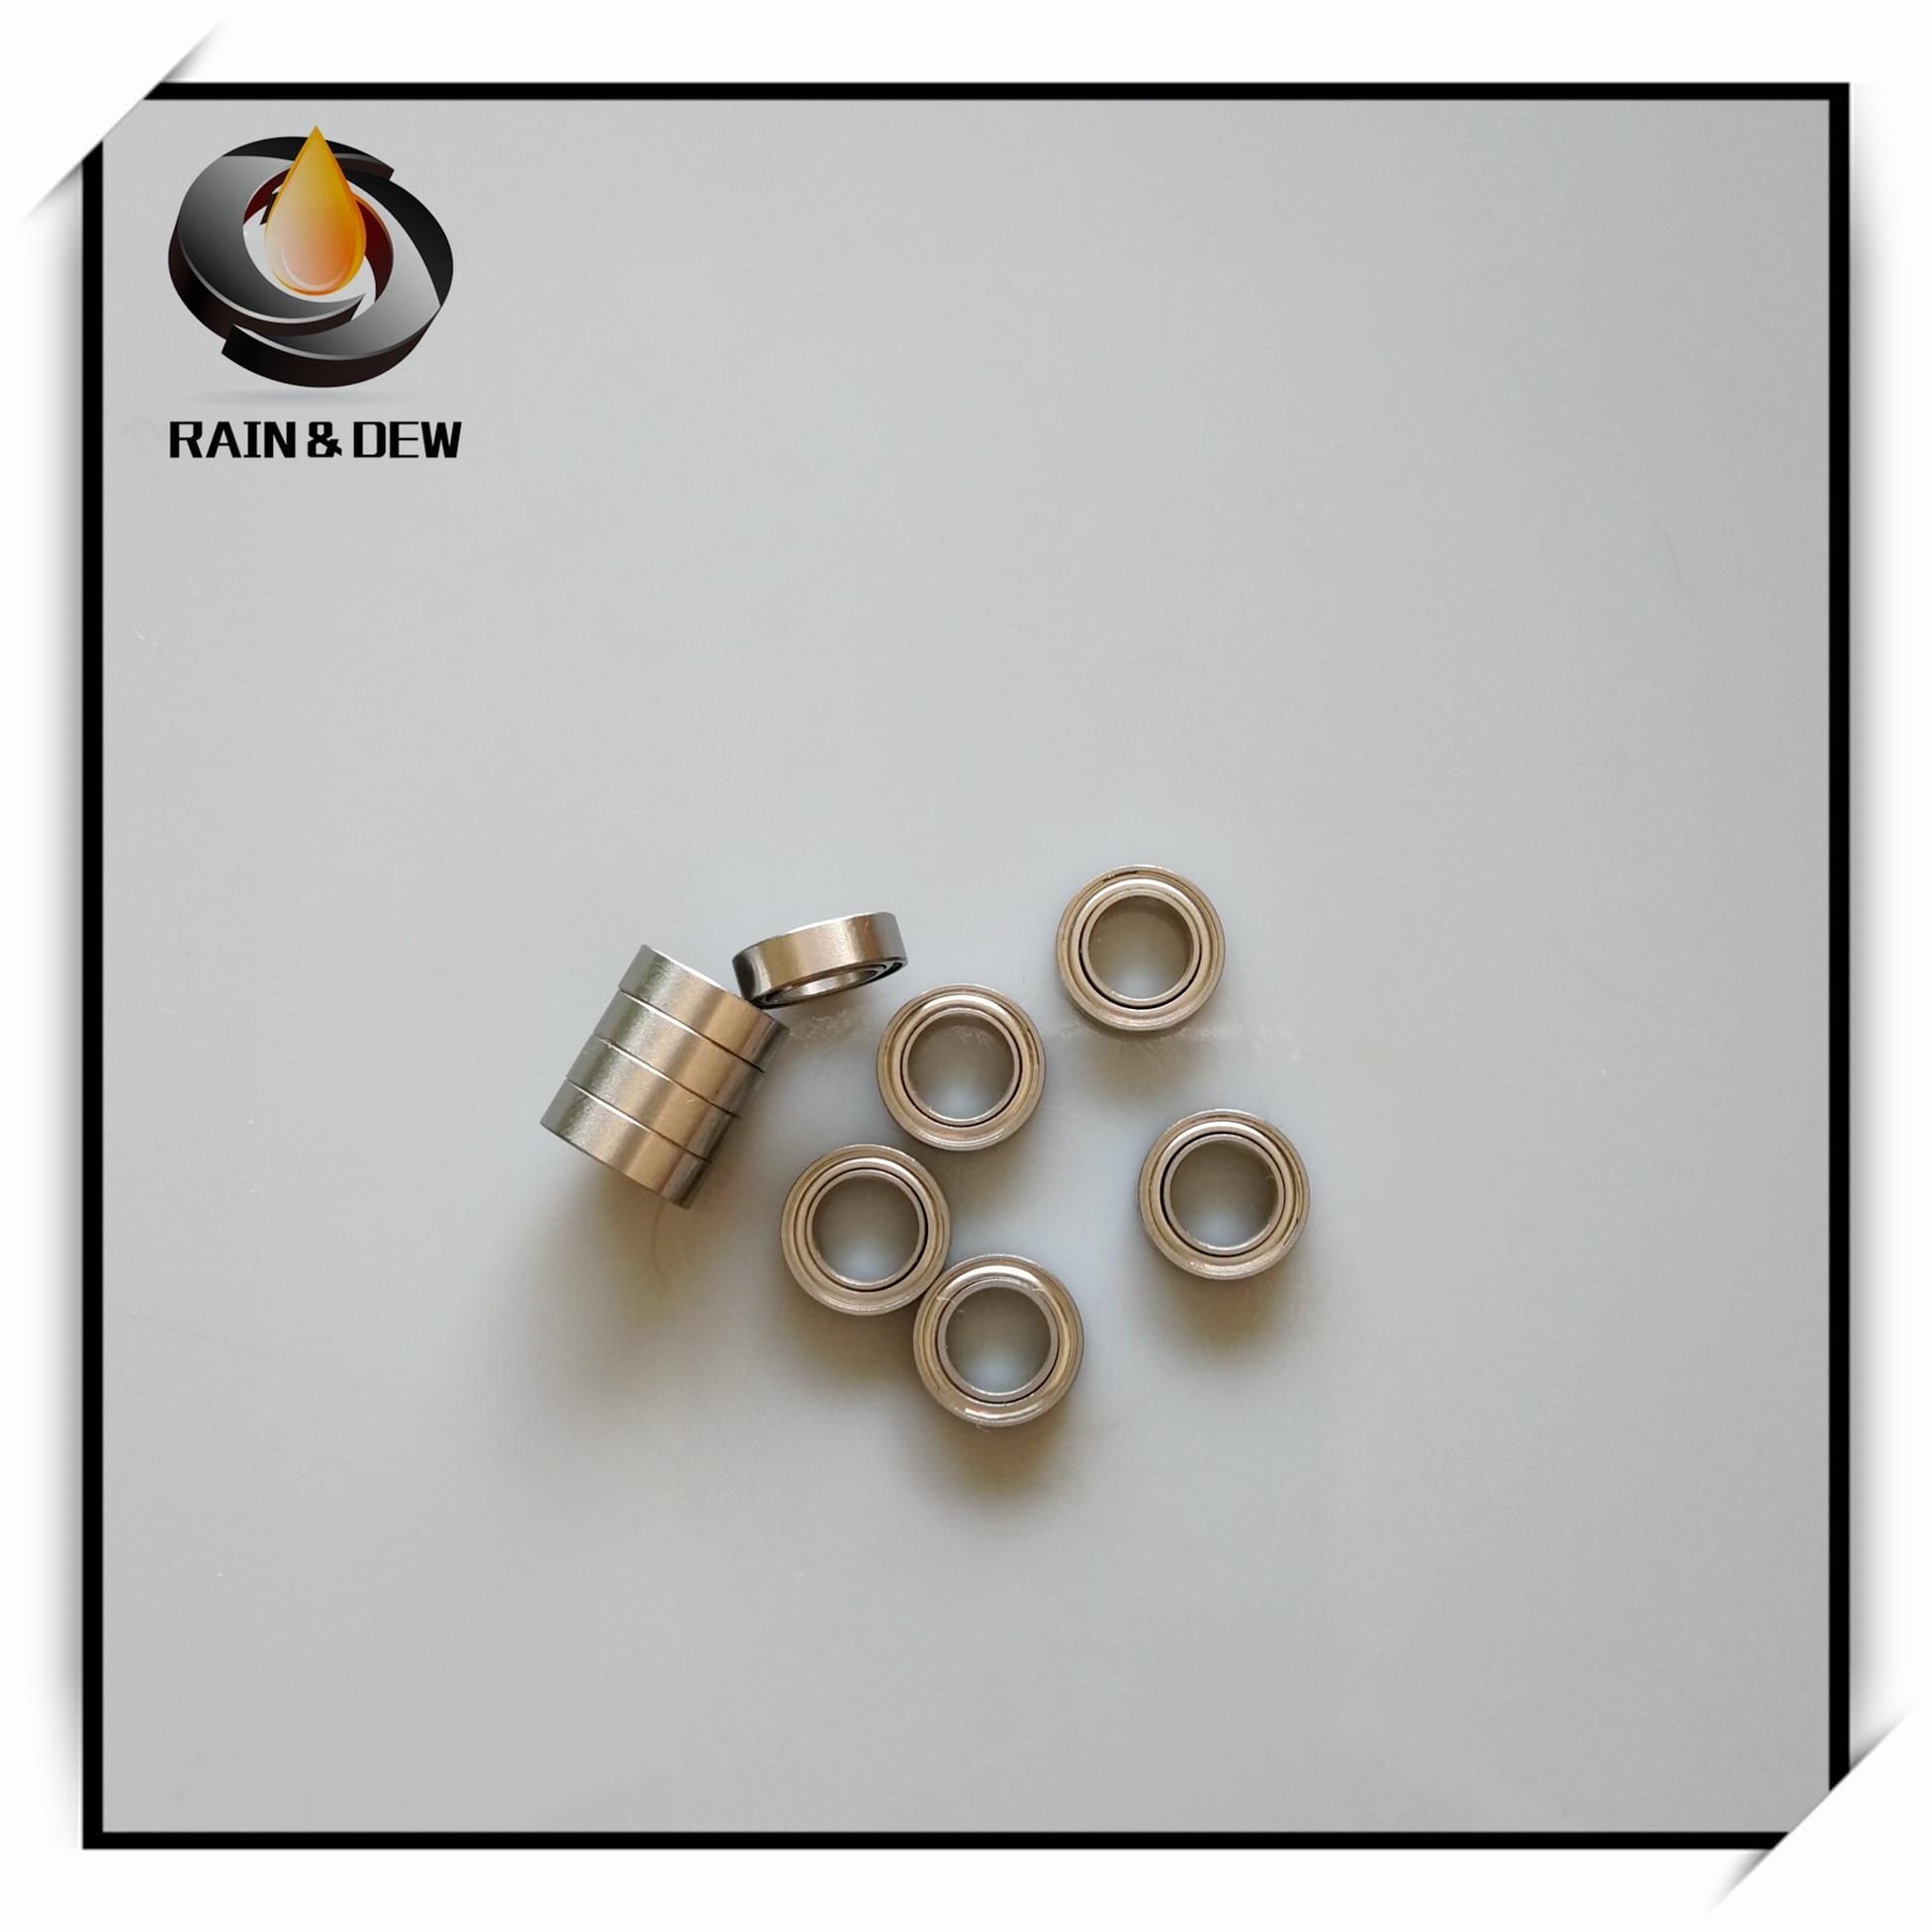 4x9x4 mm 10 PCS 440C Stainless Steel Ball Bearing Bearings S684ZZ 684ZZ